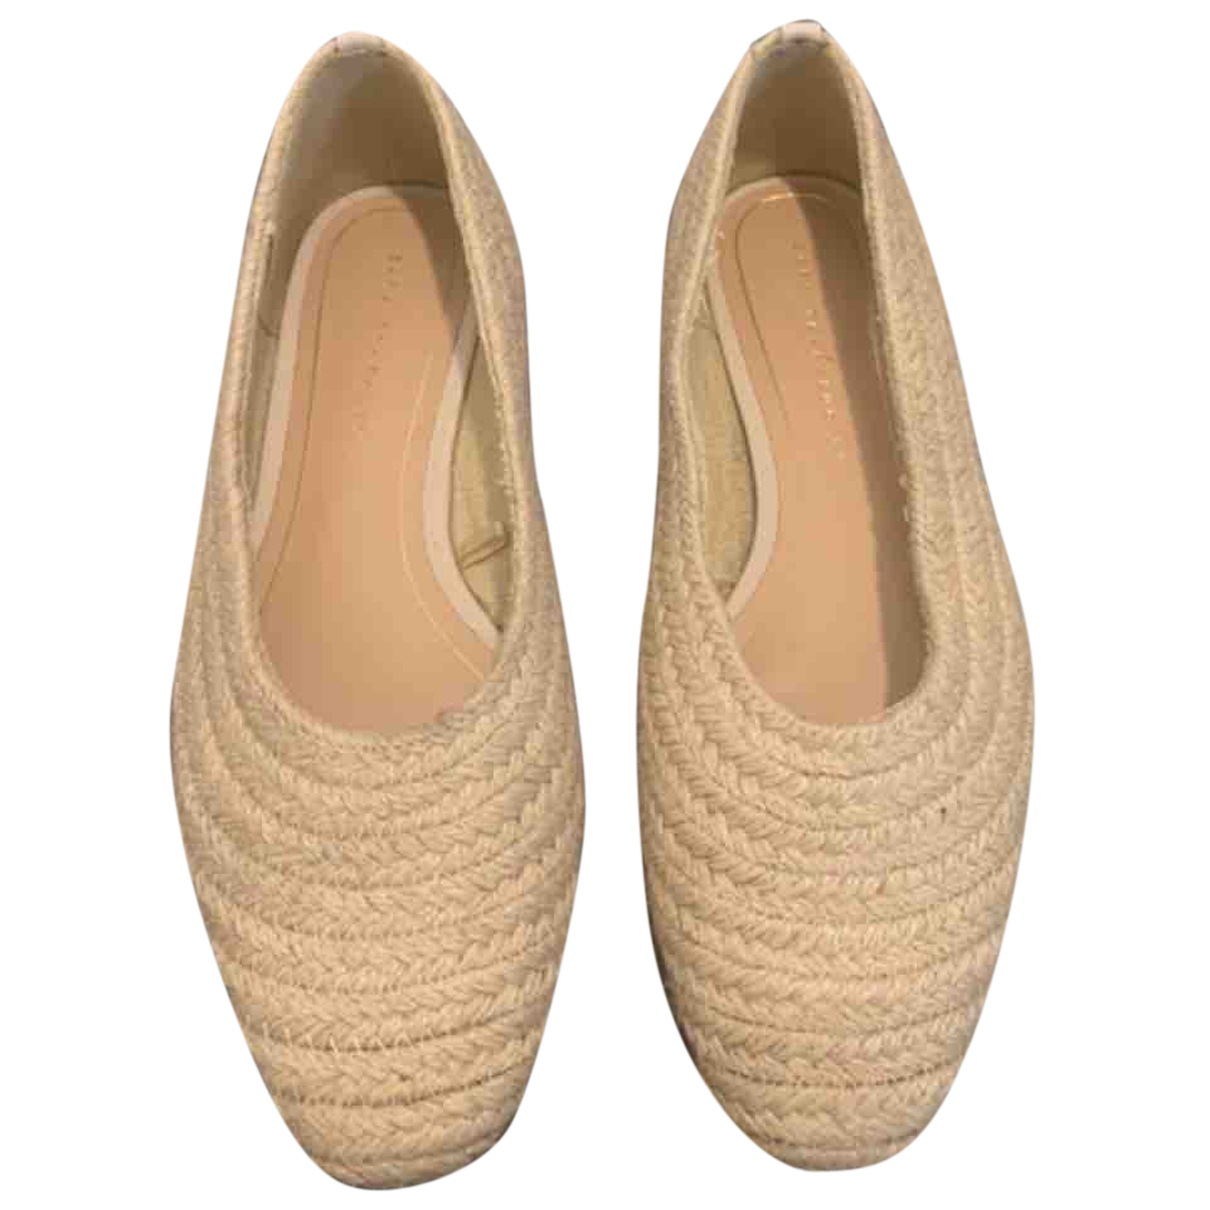 Zara N Beige Cloth Flats for Women 37 EU